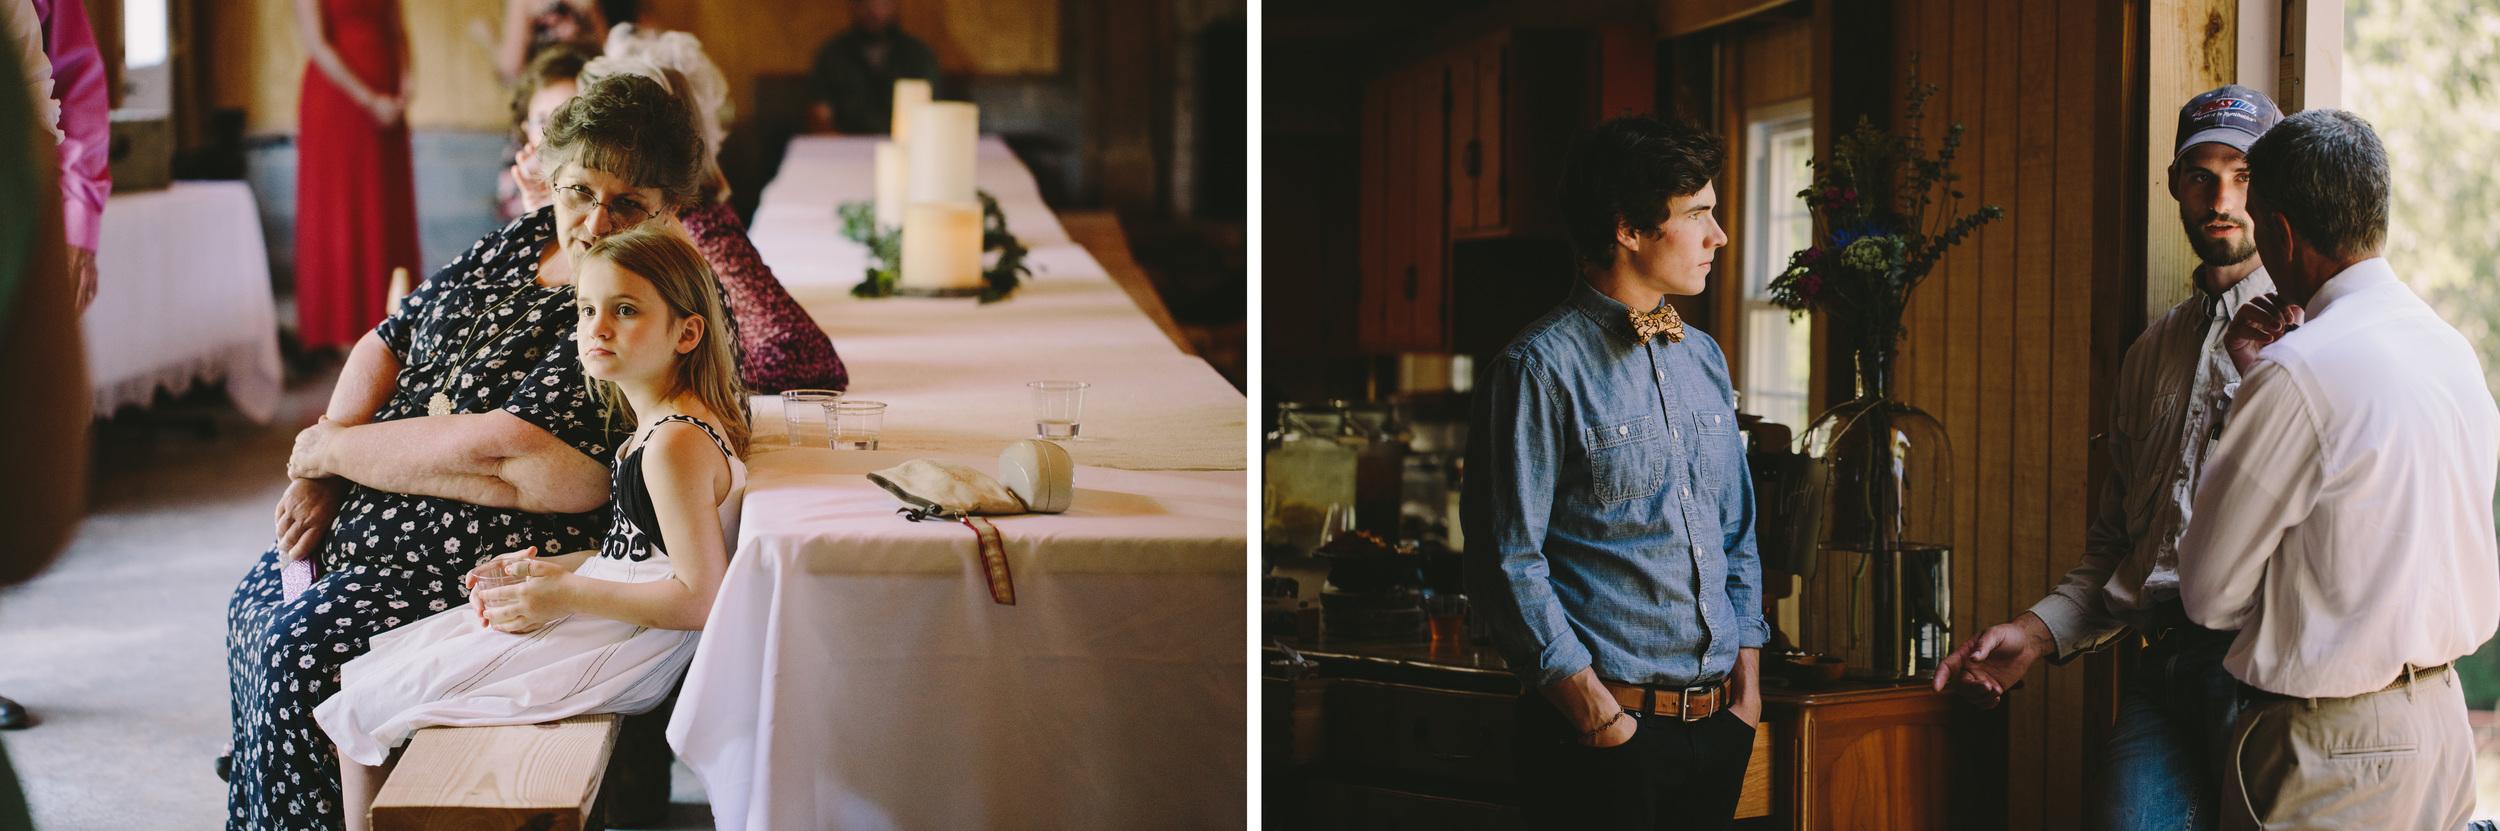 Zack + Hannah Millsaps Wedding in Greenville SC Nashville Wedding Photographer Photography Anthology-23 copy.jpg